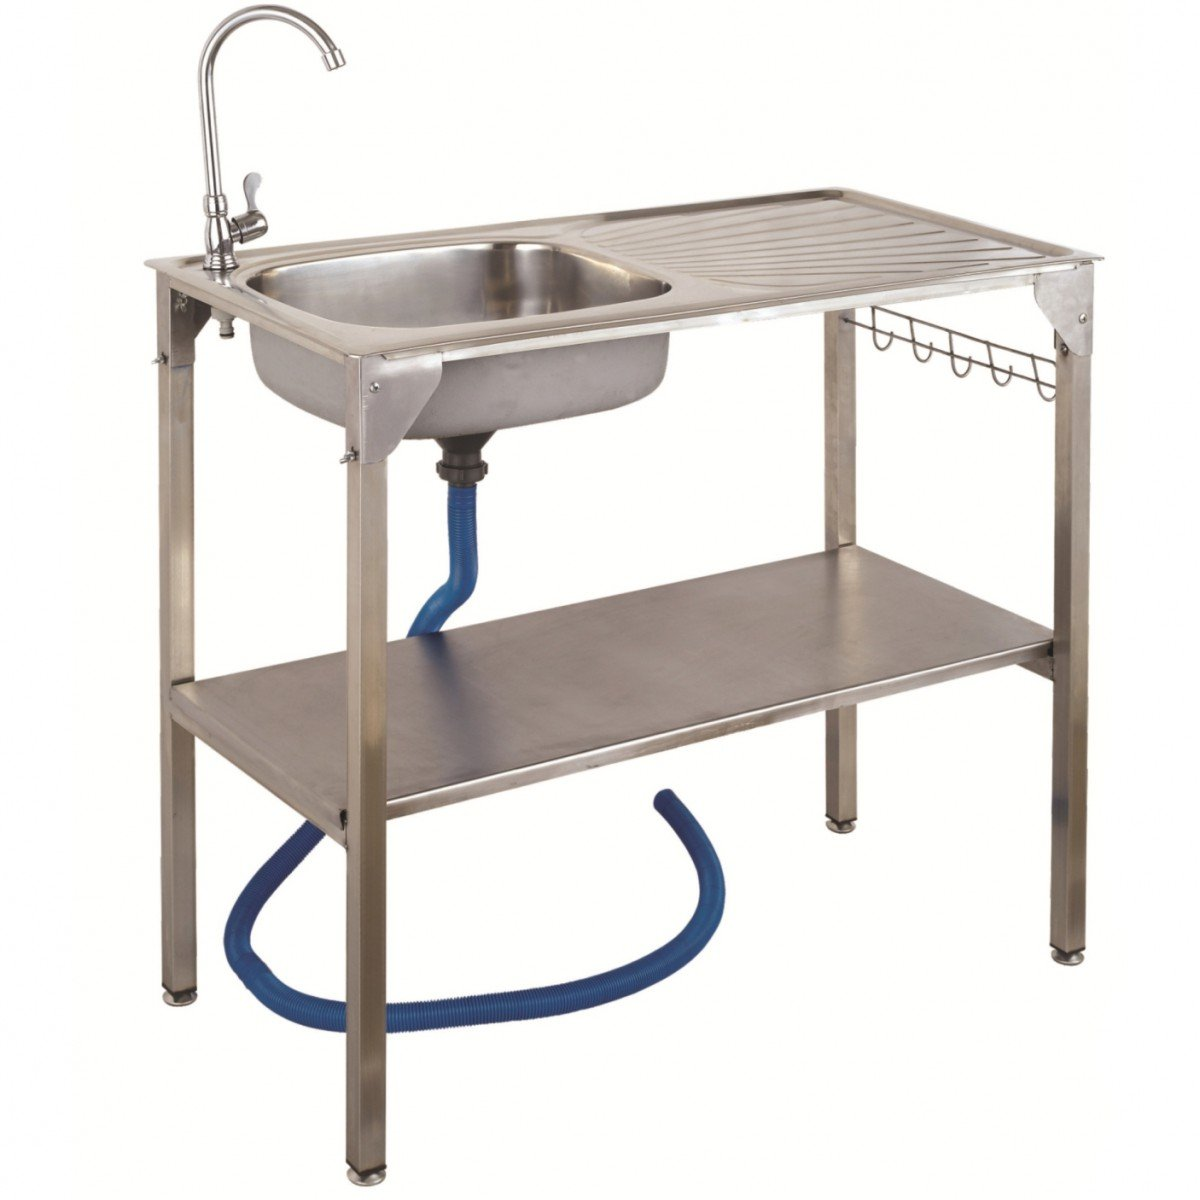 Waschbecken Küche Edelstahl | grafffit.com